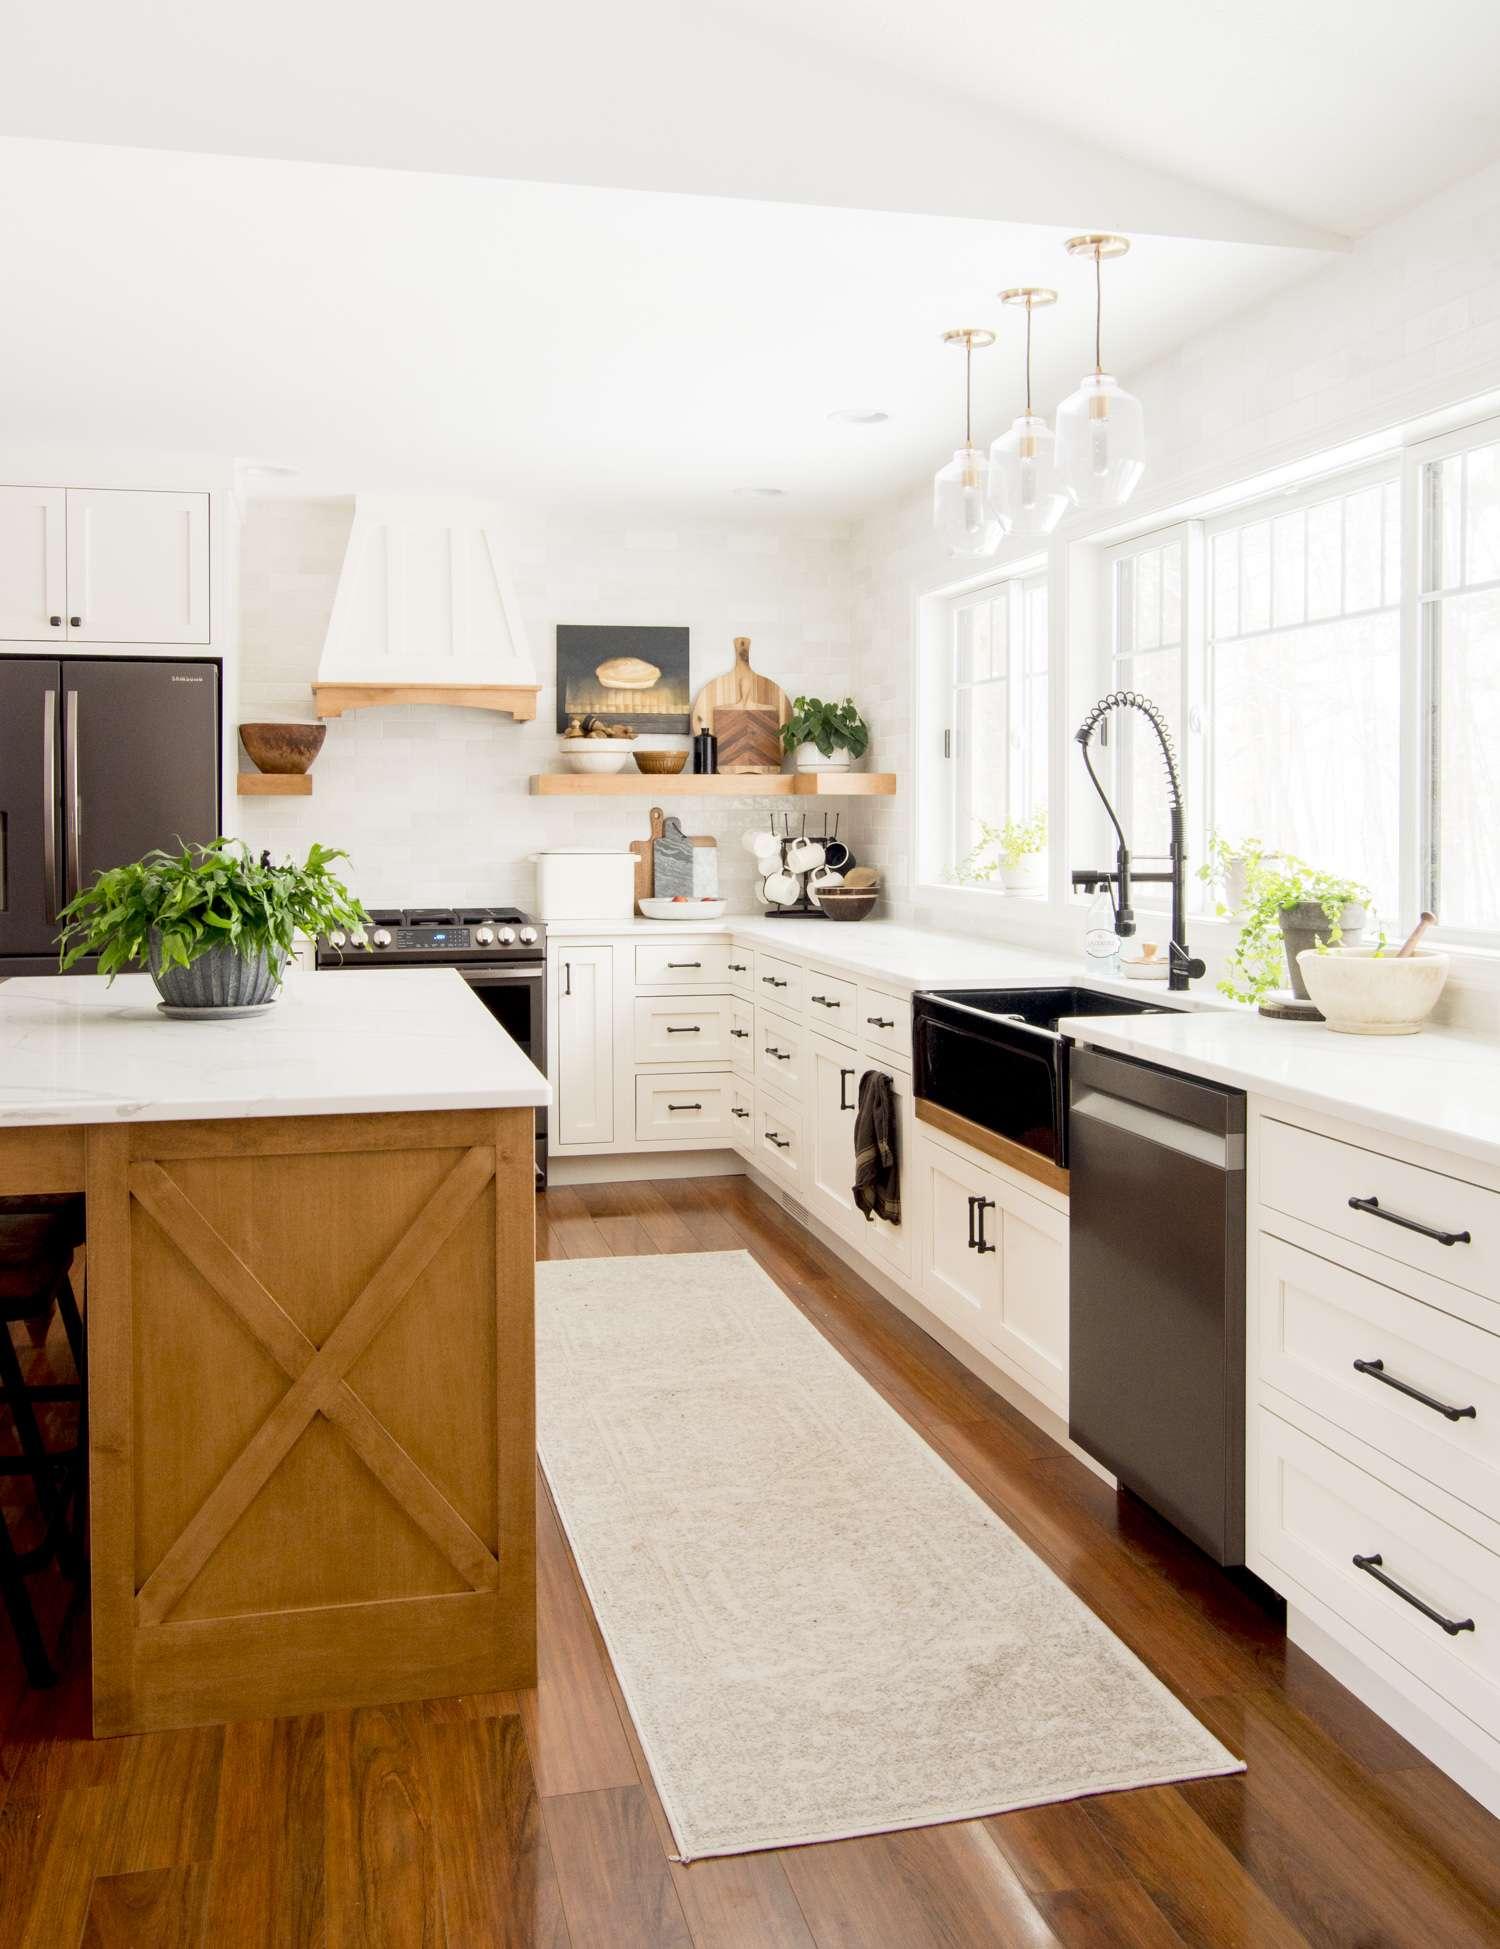 Modern farmhouse kitchen design.